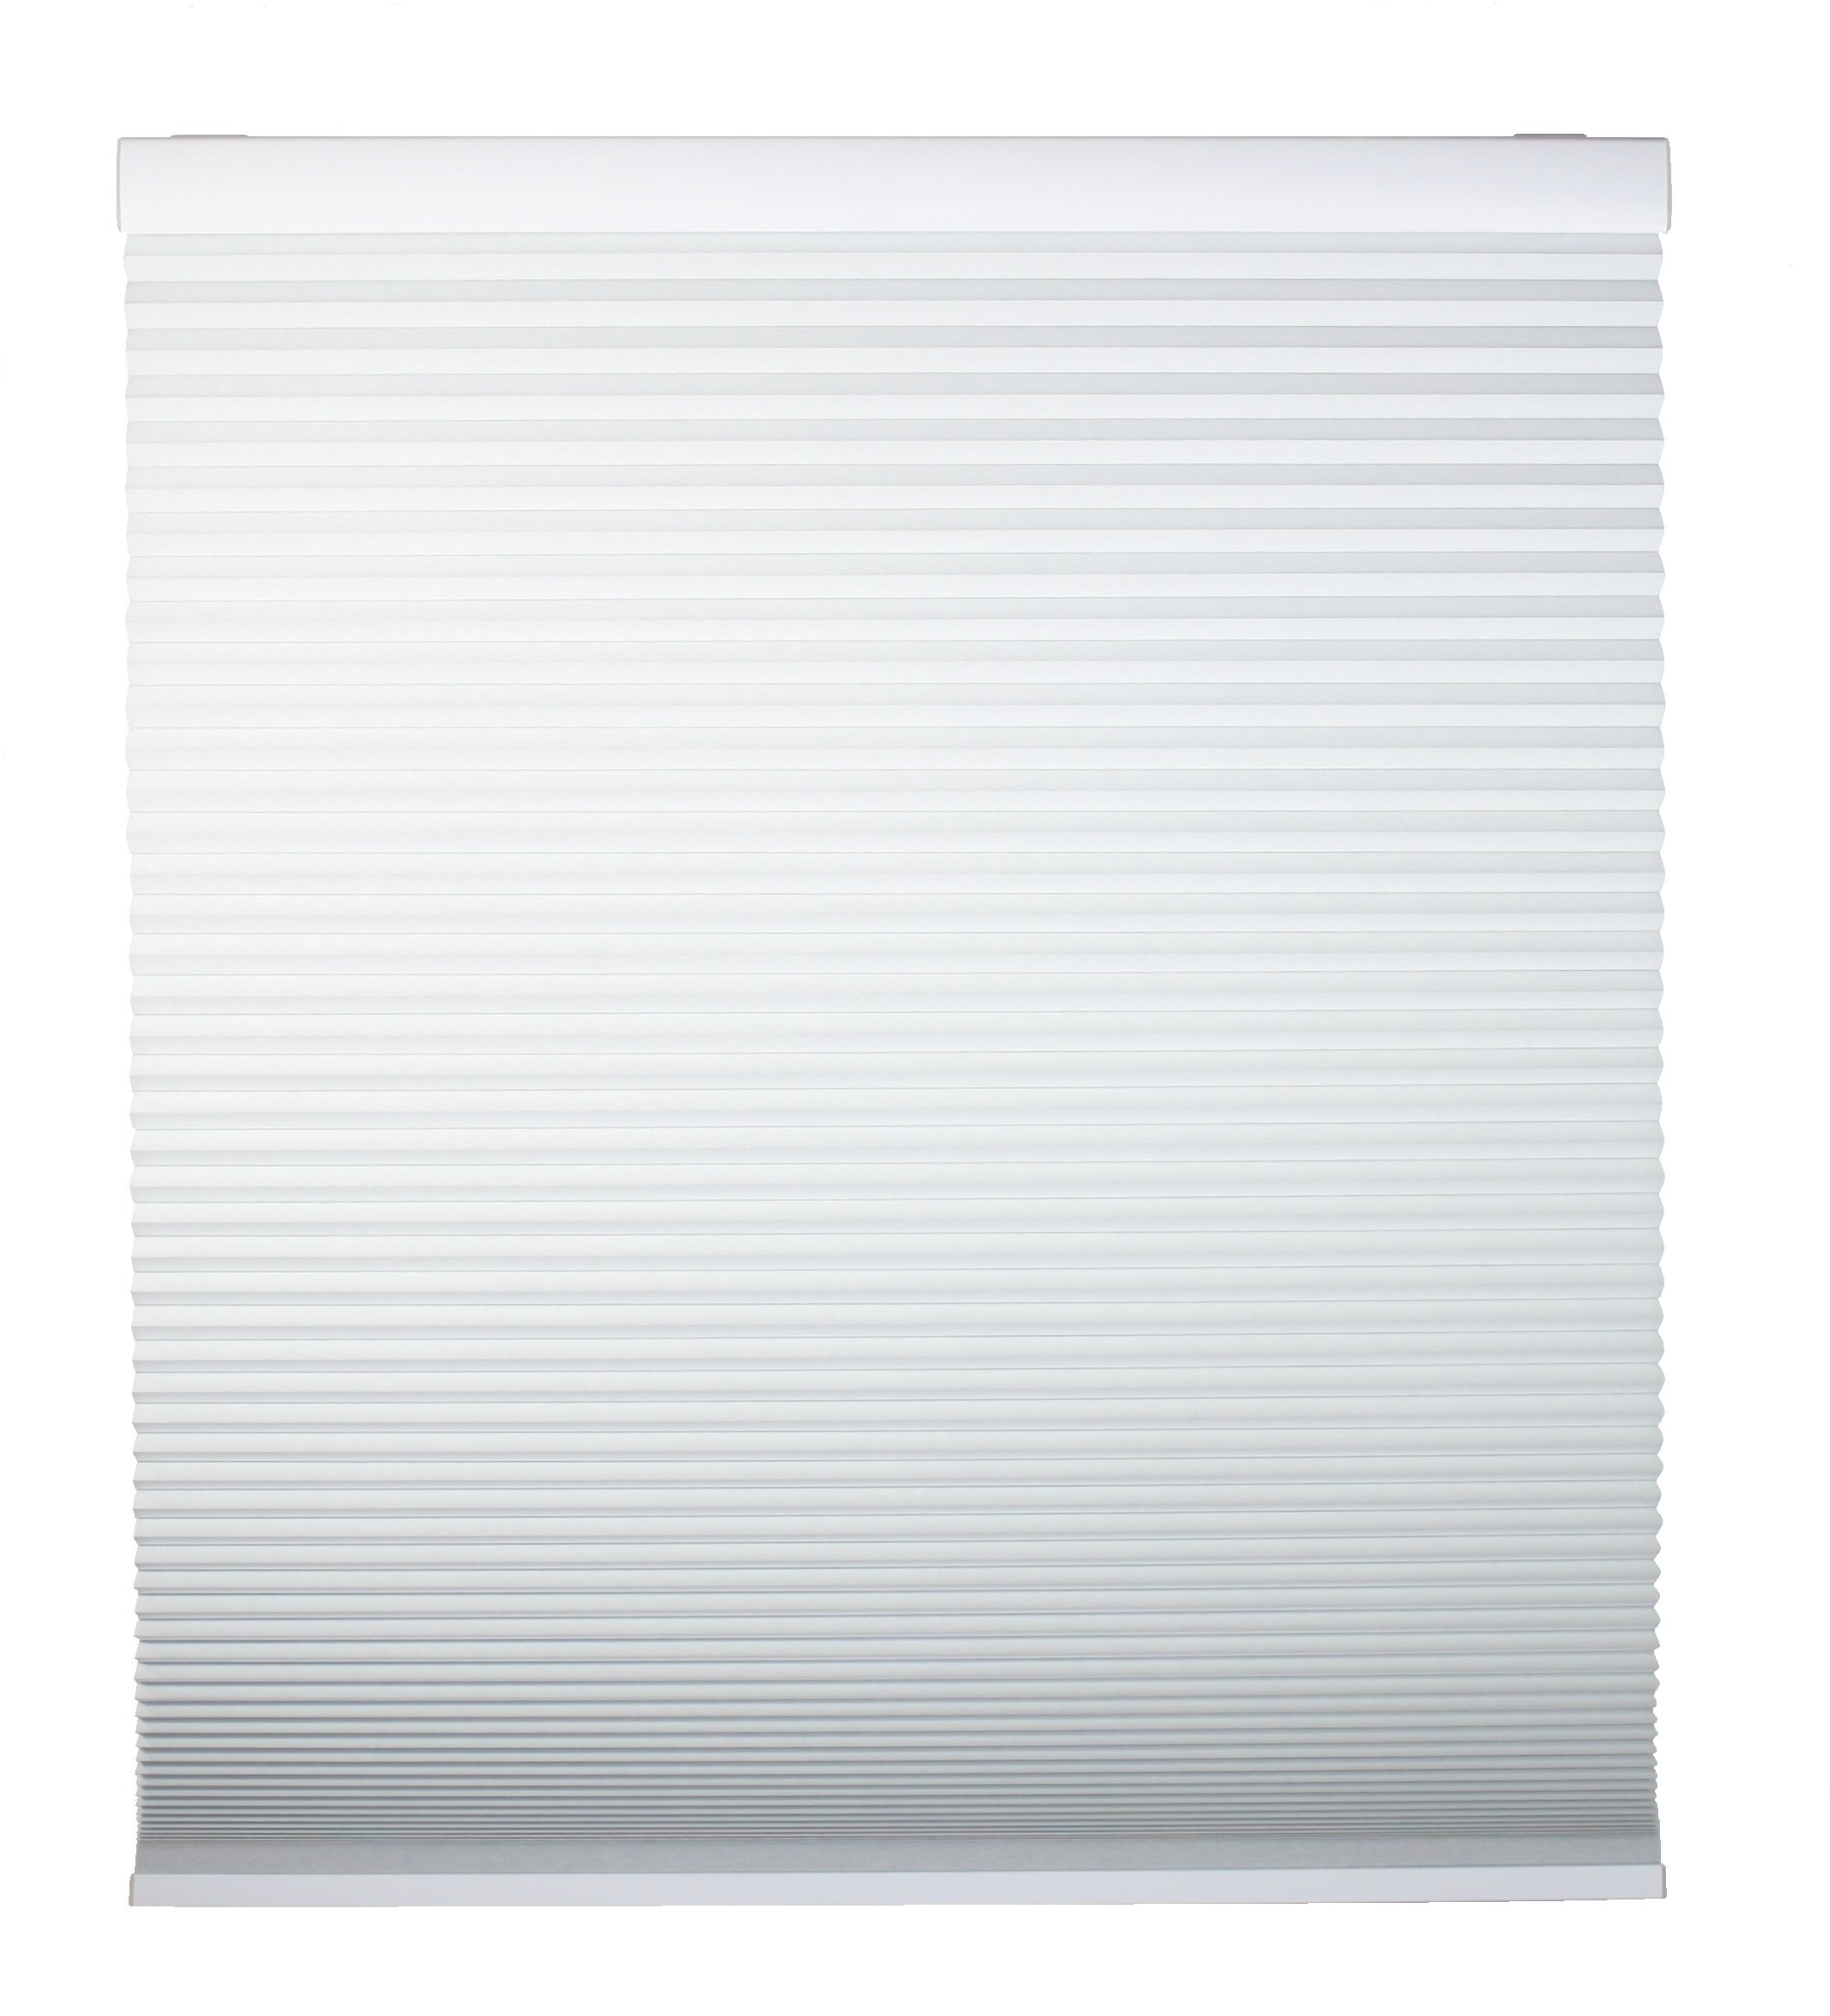 Cordless Blackout Cellular Shade 57 '' W X 64 '' L - White